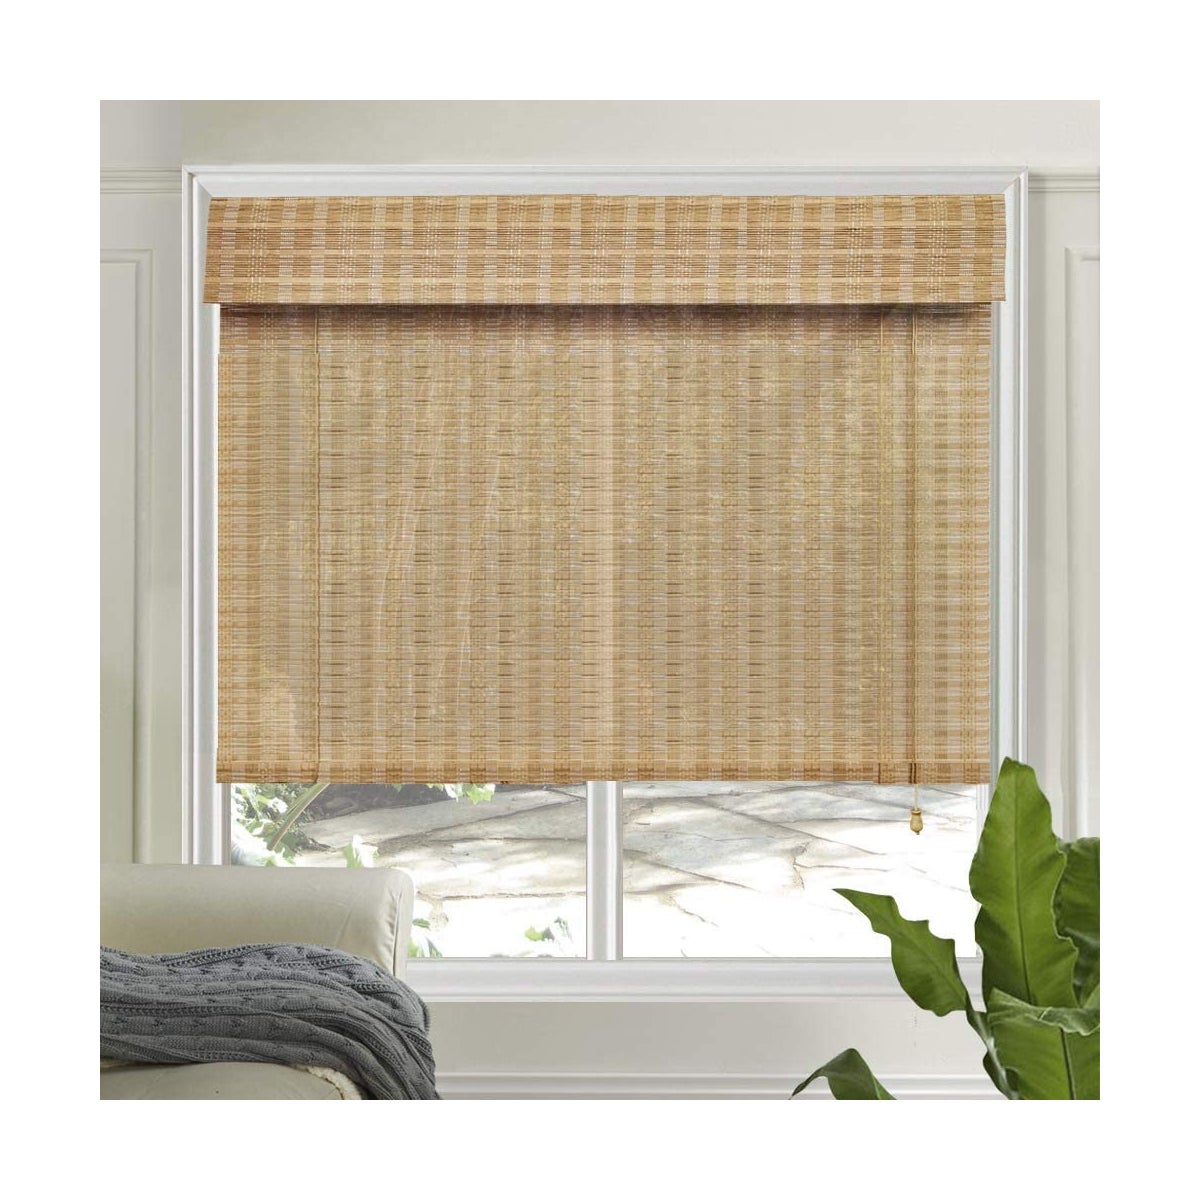 Best-Blinds-Option-Letau-Bamboo-Light-Filtering-Roman-Shades